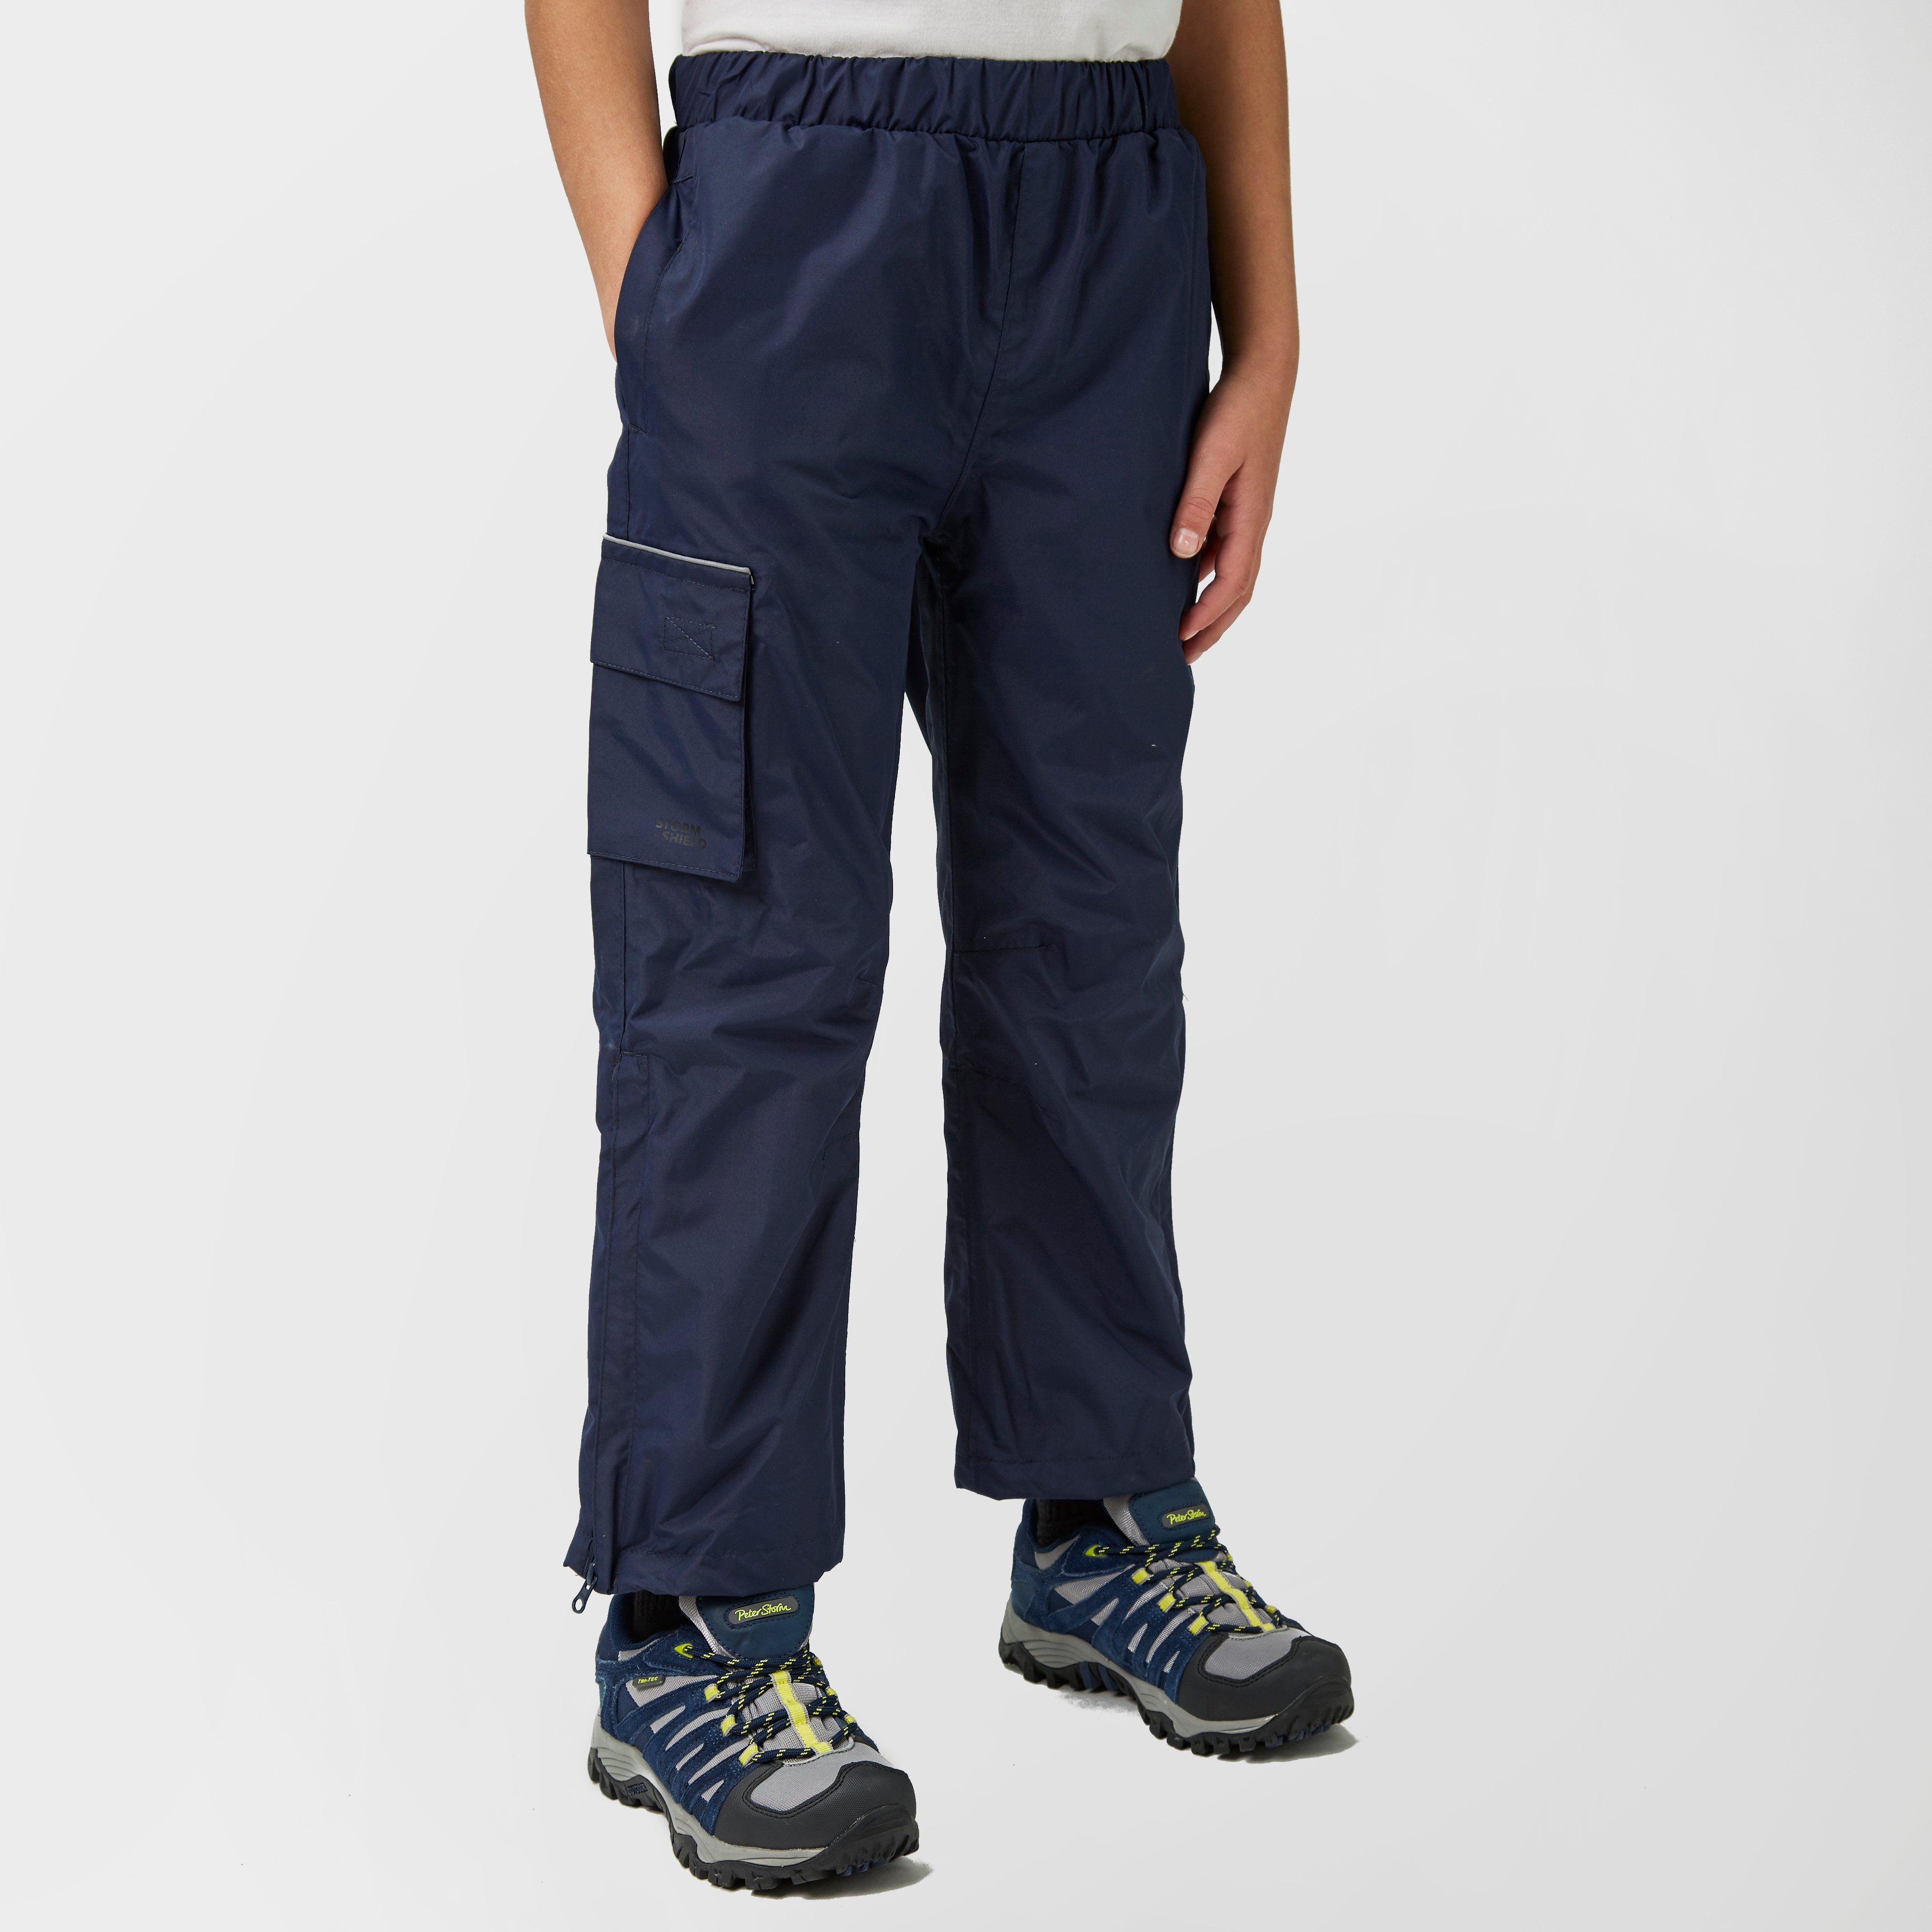 PETER STORM Kids' Unisex Typhoon Waterproof Trousers